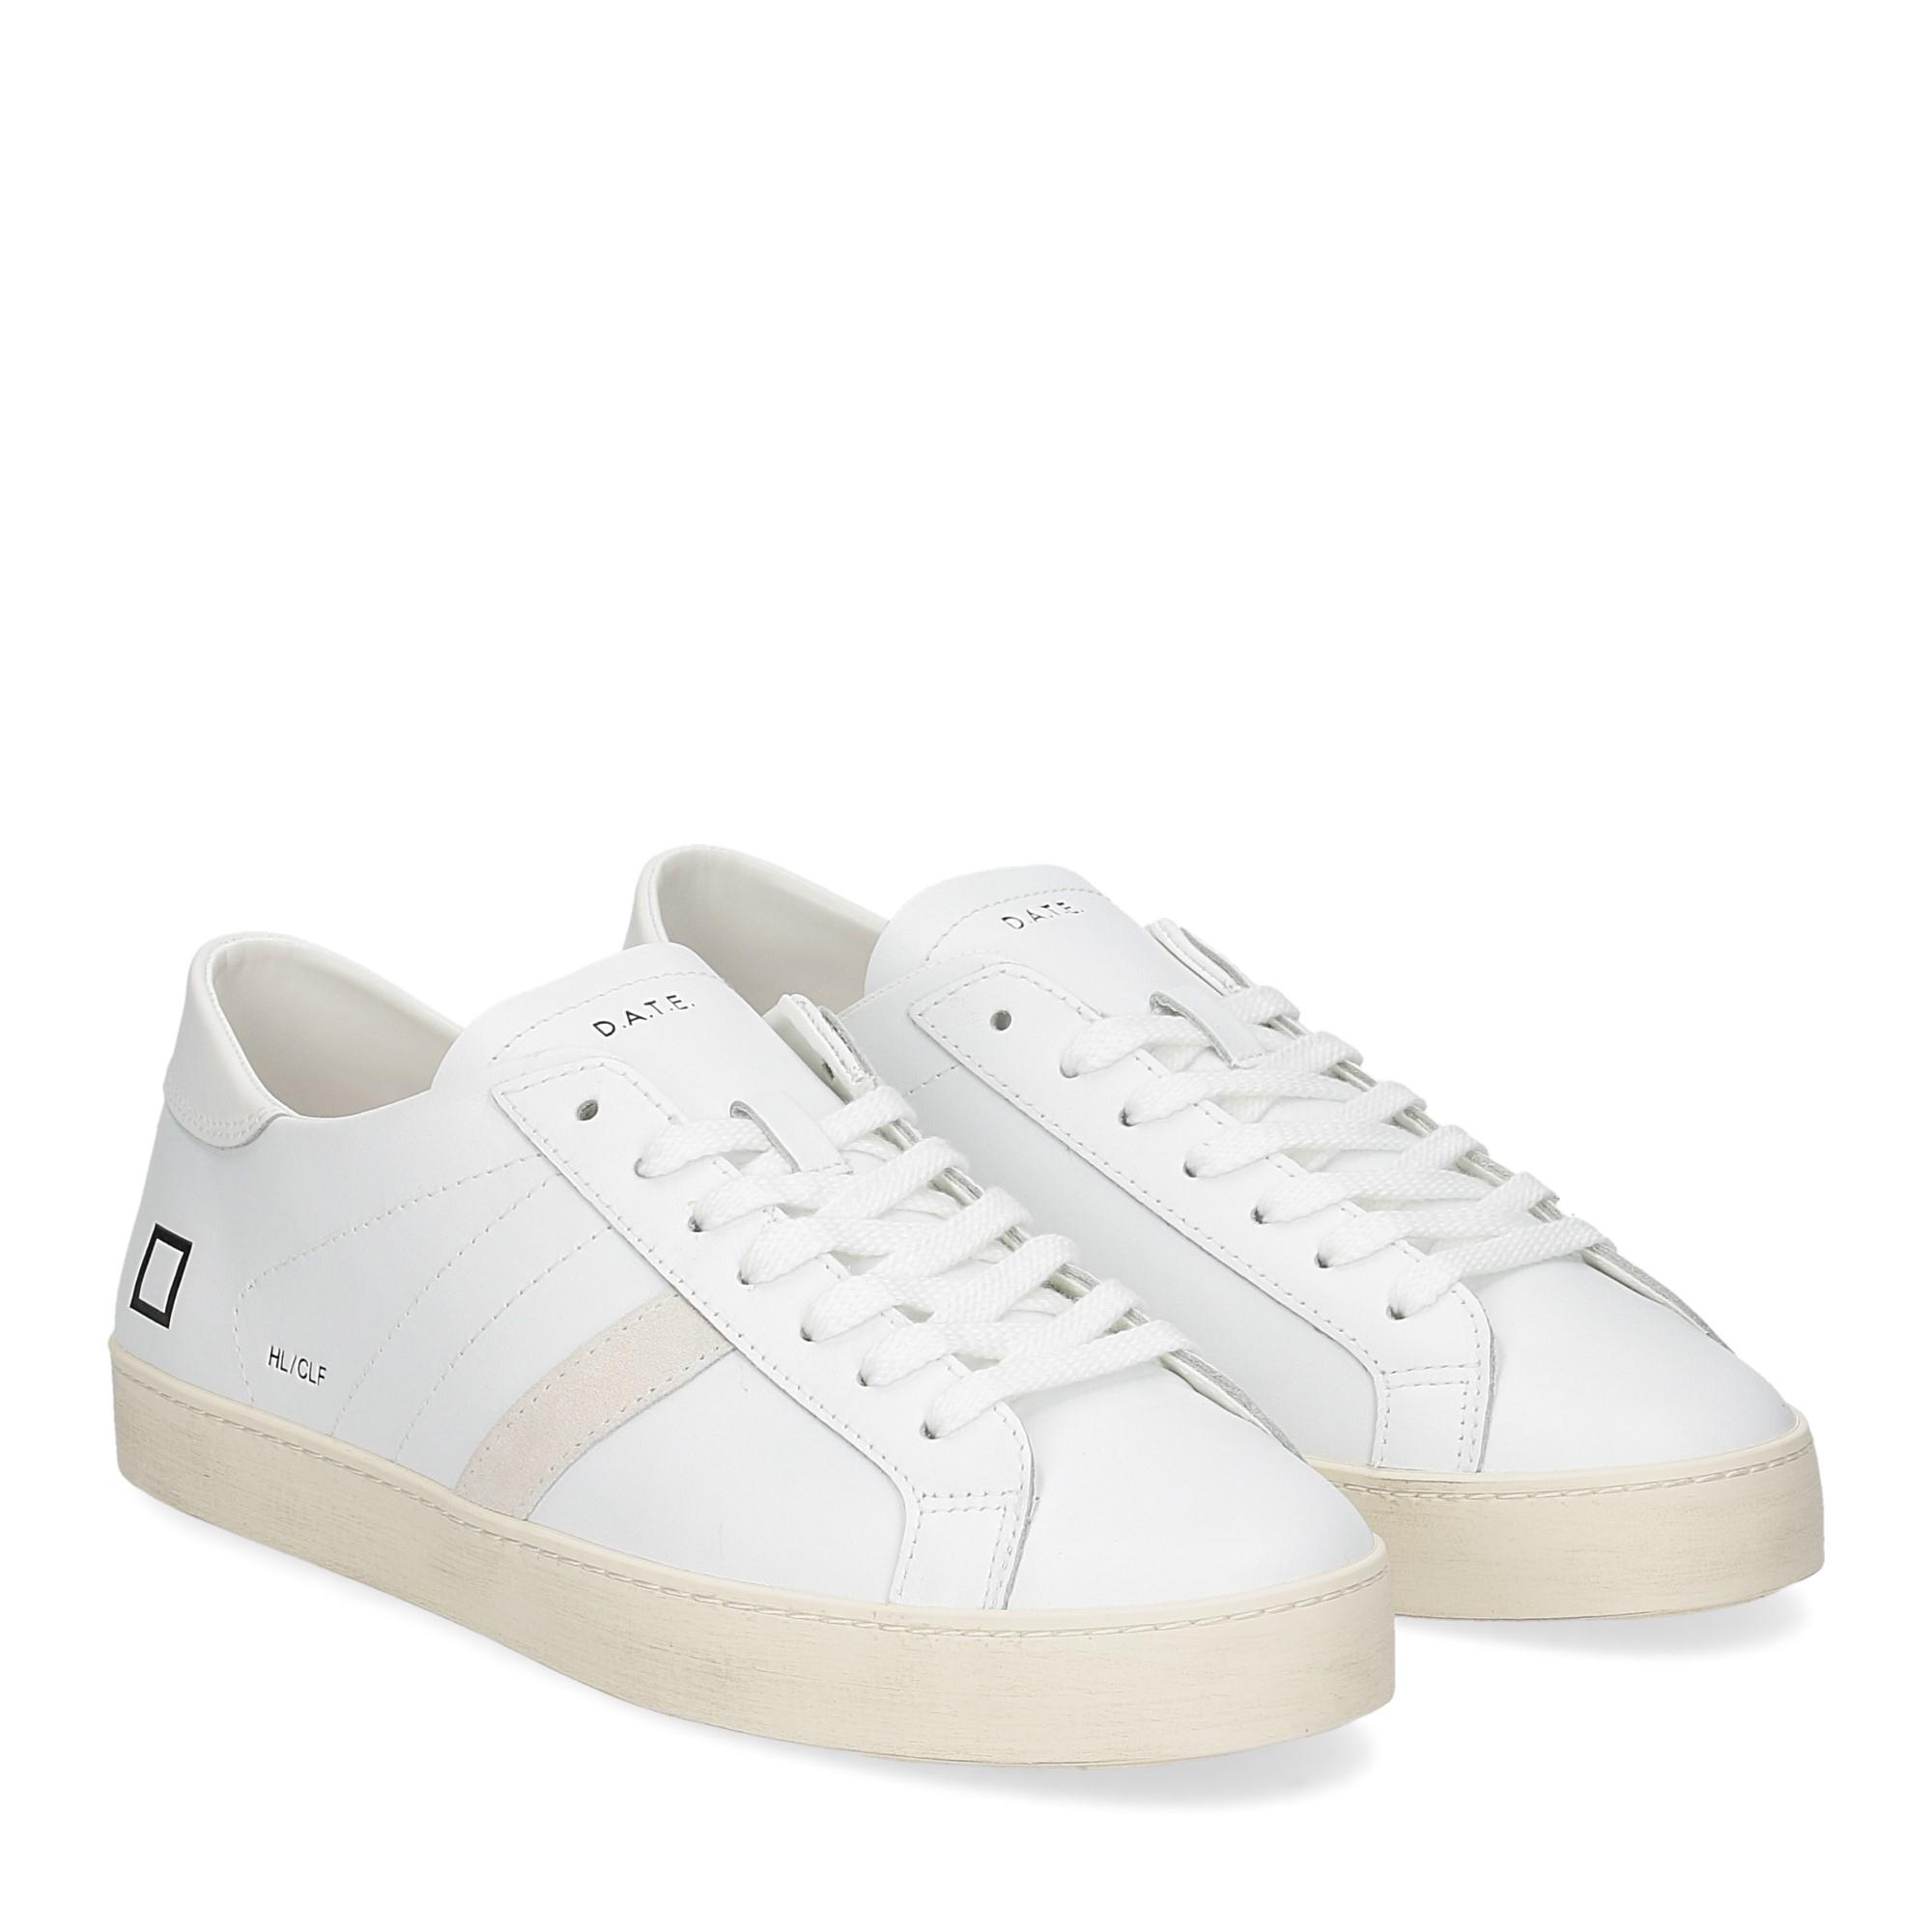 D.A.T.E. Hill low calf white